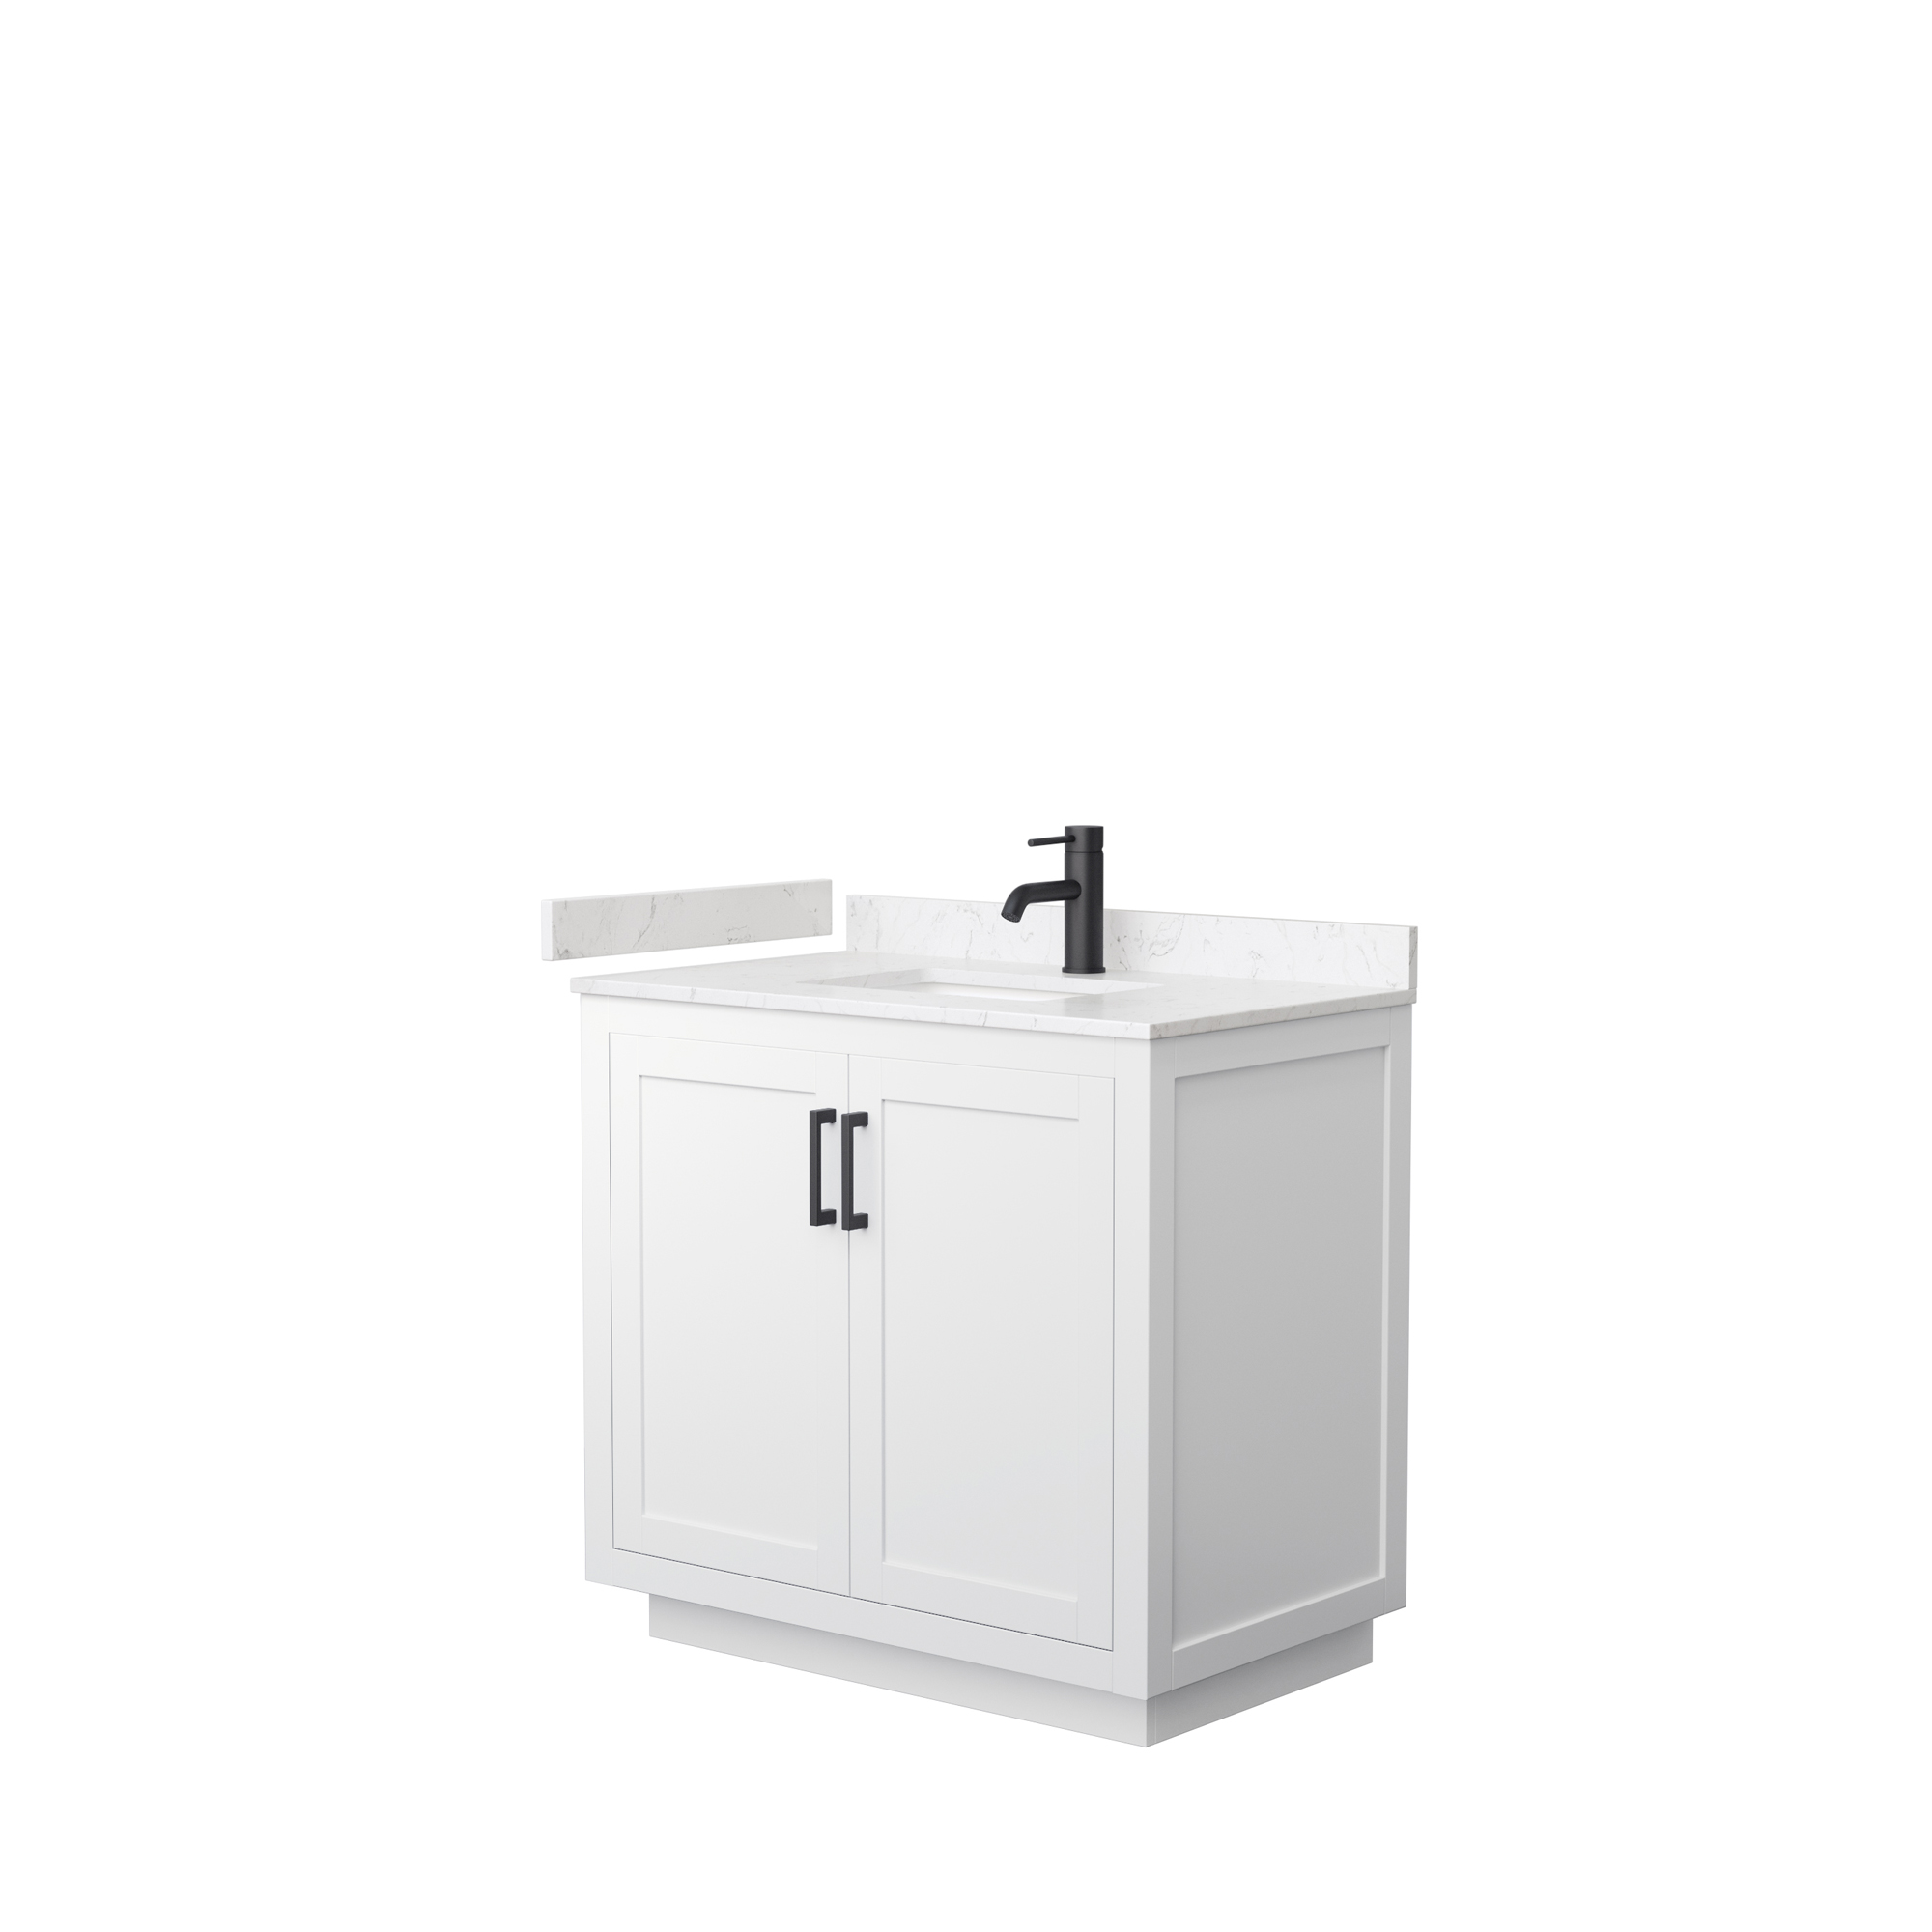 "36"" Single Bathroom Vanity in White, Light-Vein Carrara Cultured Marble Countertop, Undermount Square Sink, Matte Black Trim"